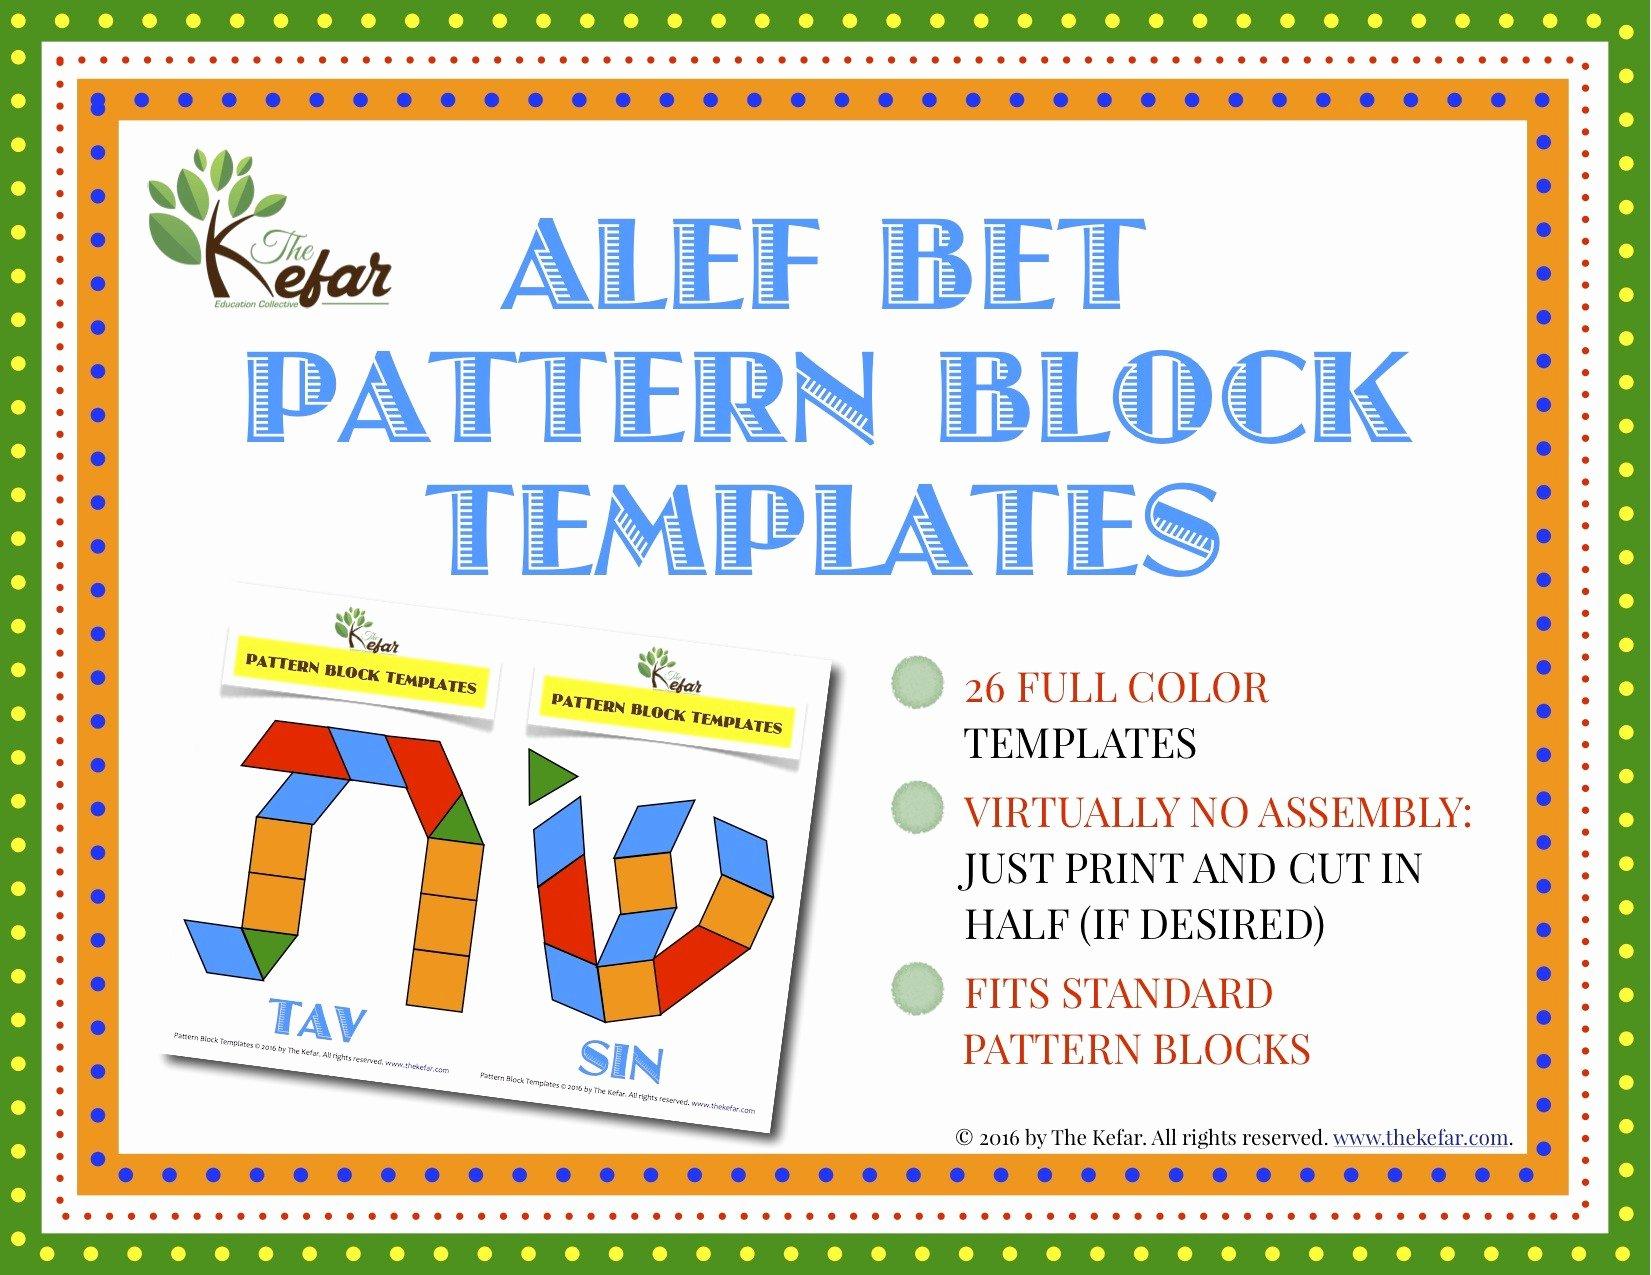 Pattern Block Templates Pdf Beautiful Alef Bet Pattern Block Templates